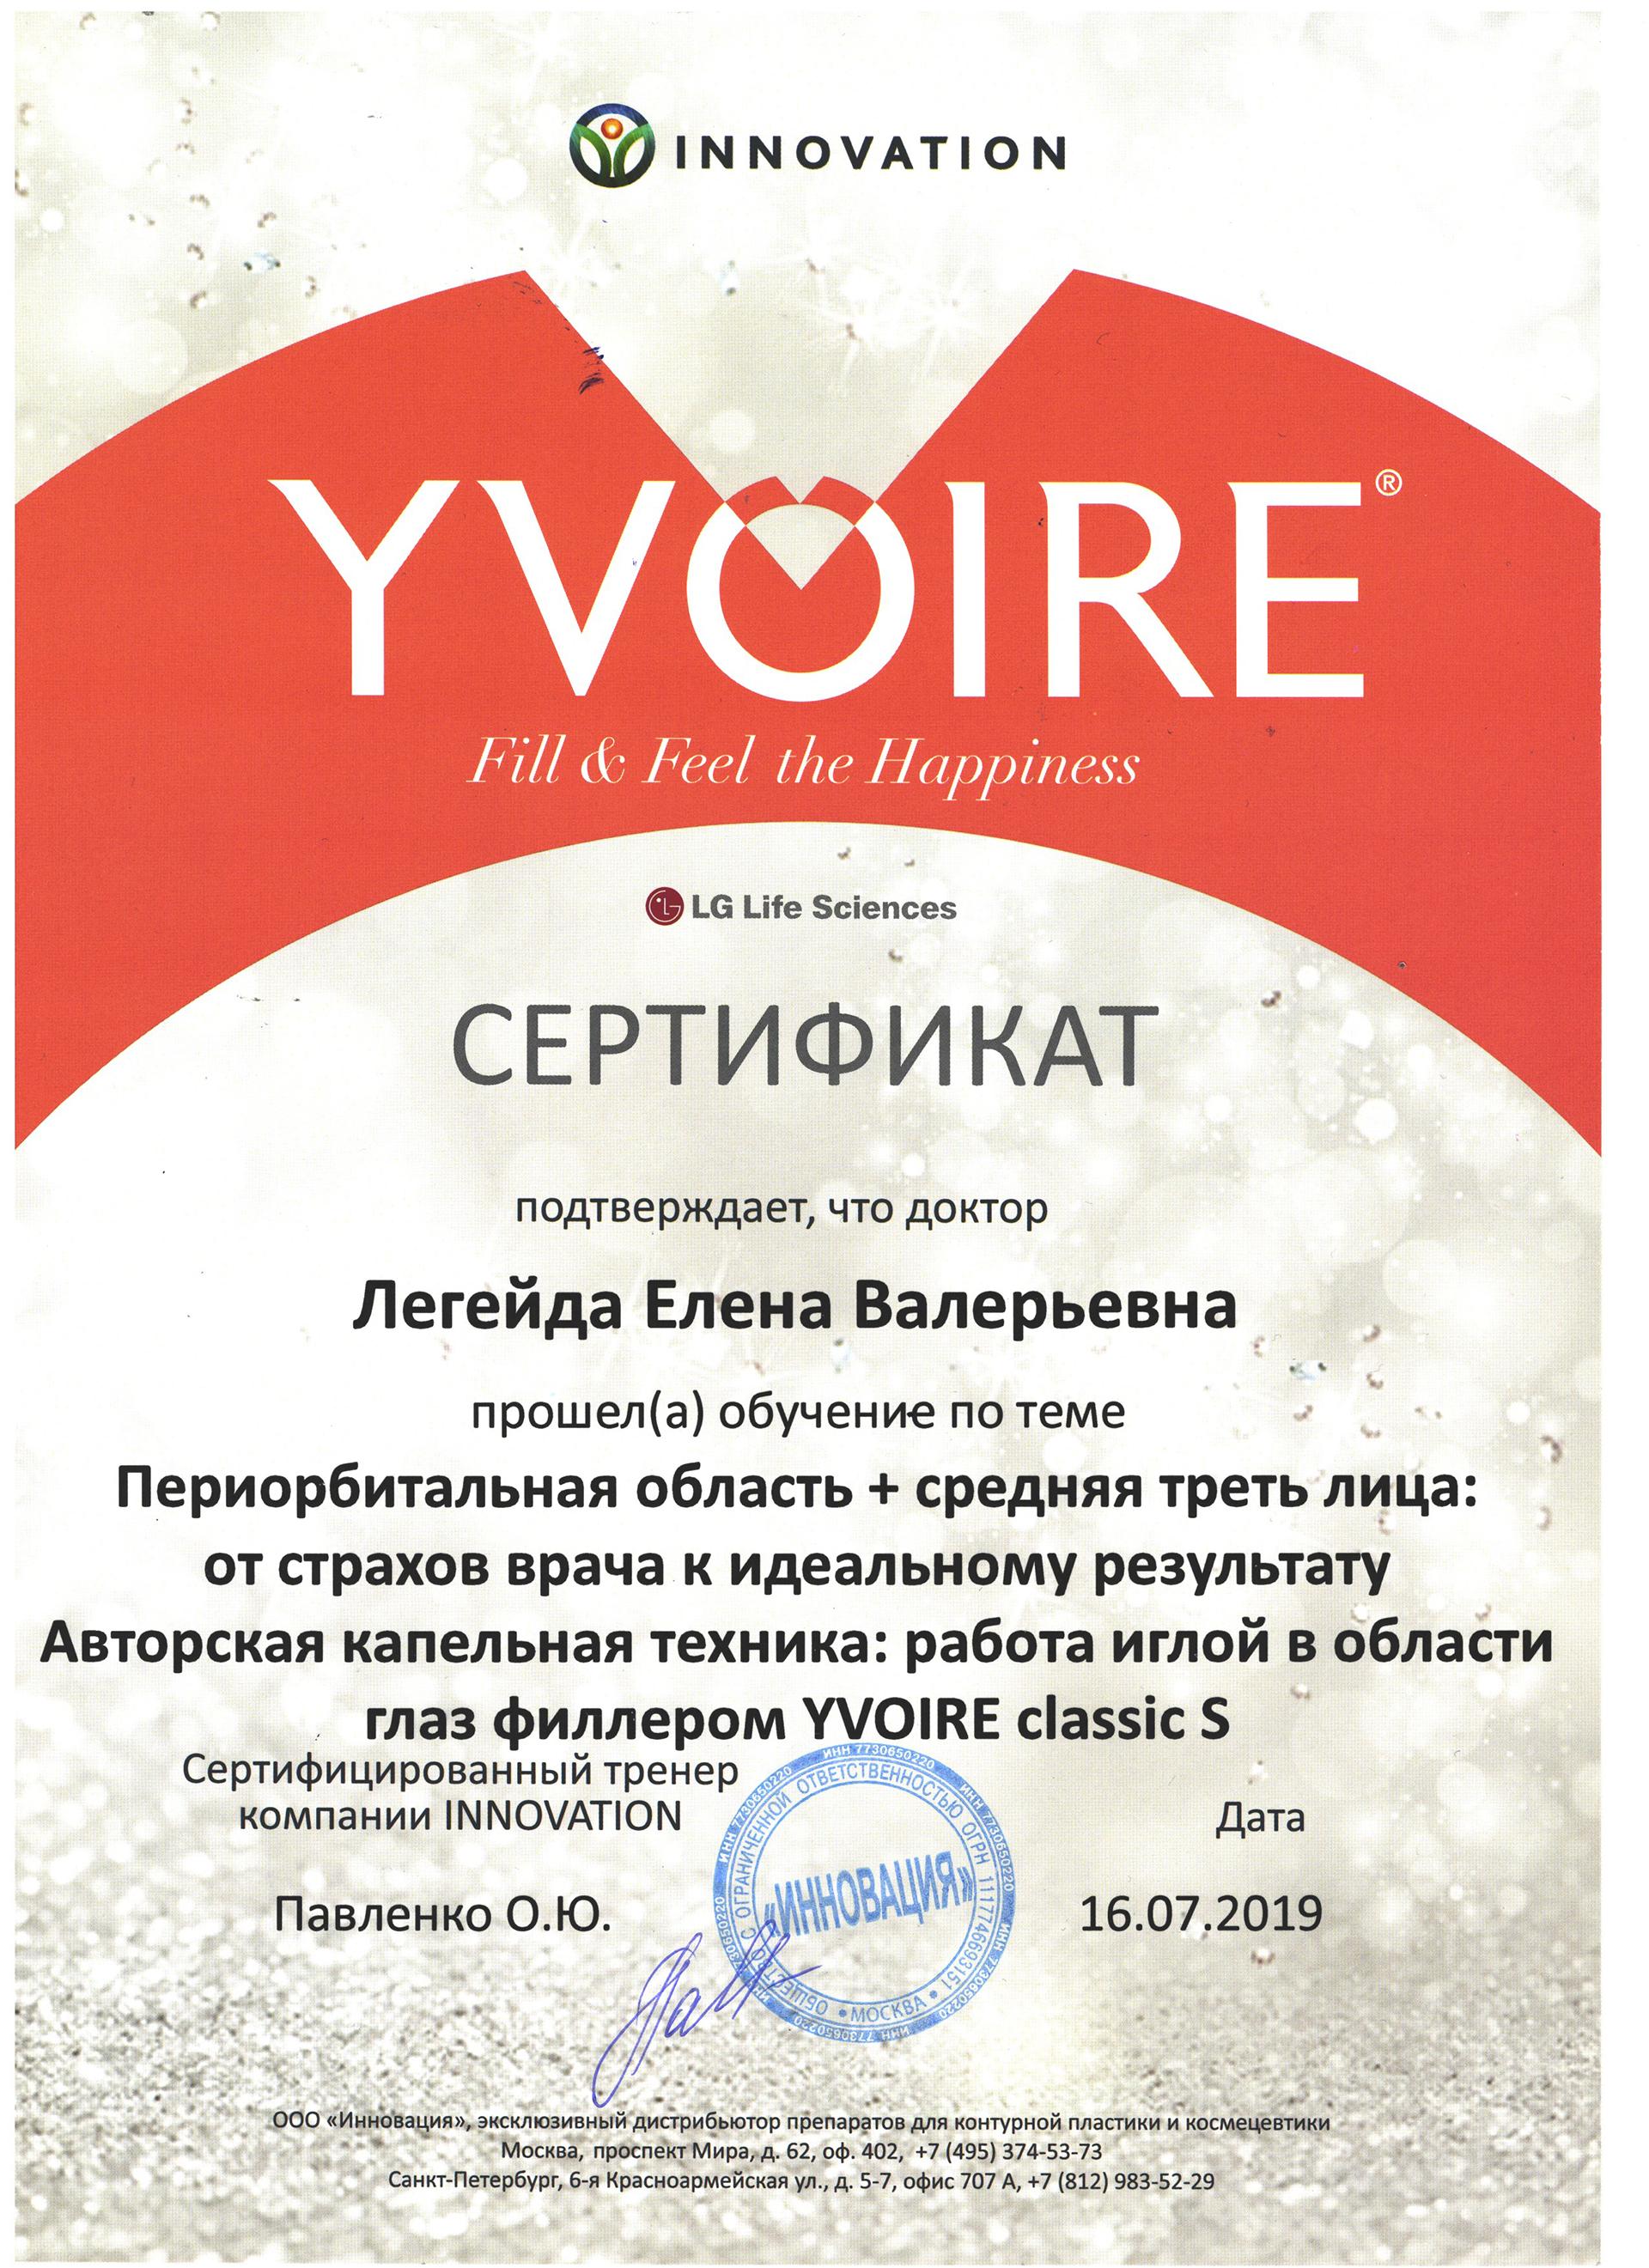 Сертификат — Yvoire. Легейда Елена Валерьевна